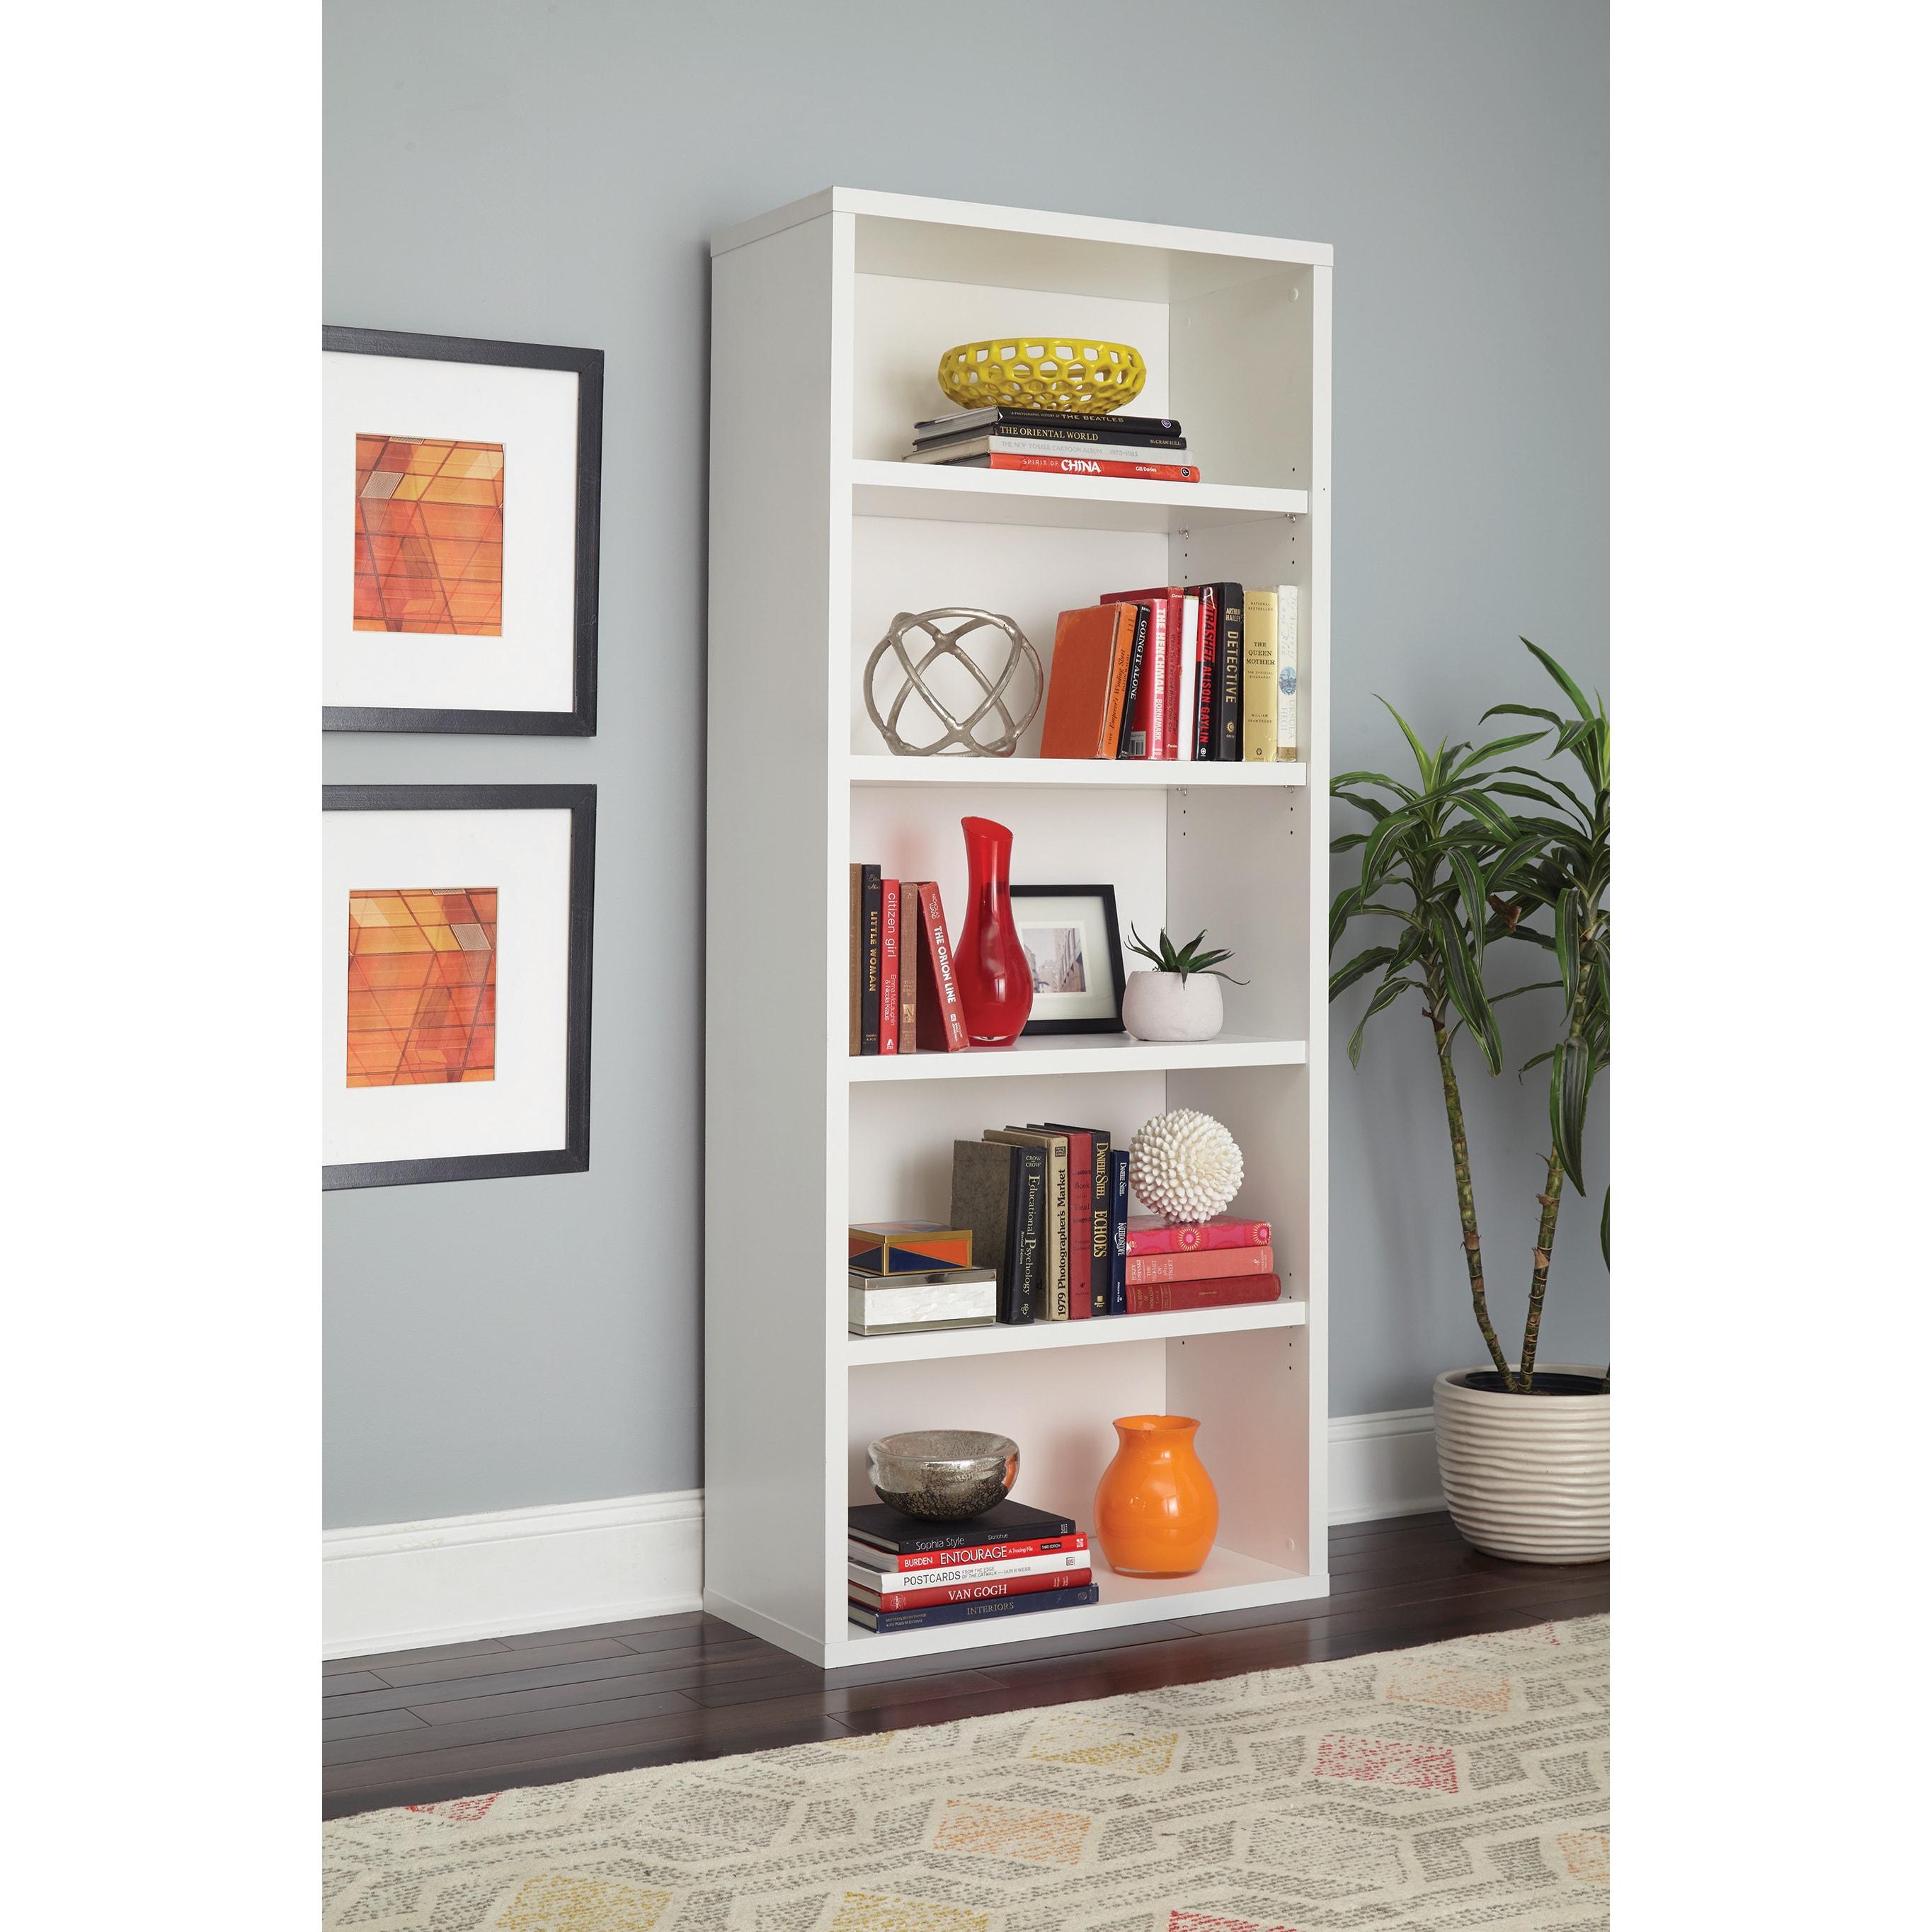 Closetmaid Premium White 5-shelf Adjustable Bookcase (Whi...